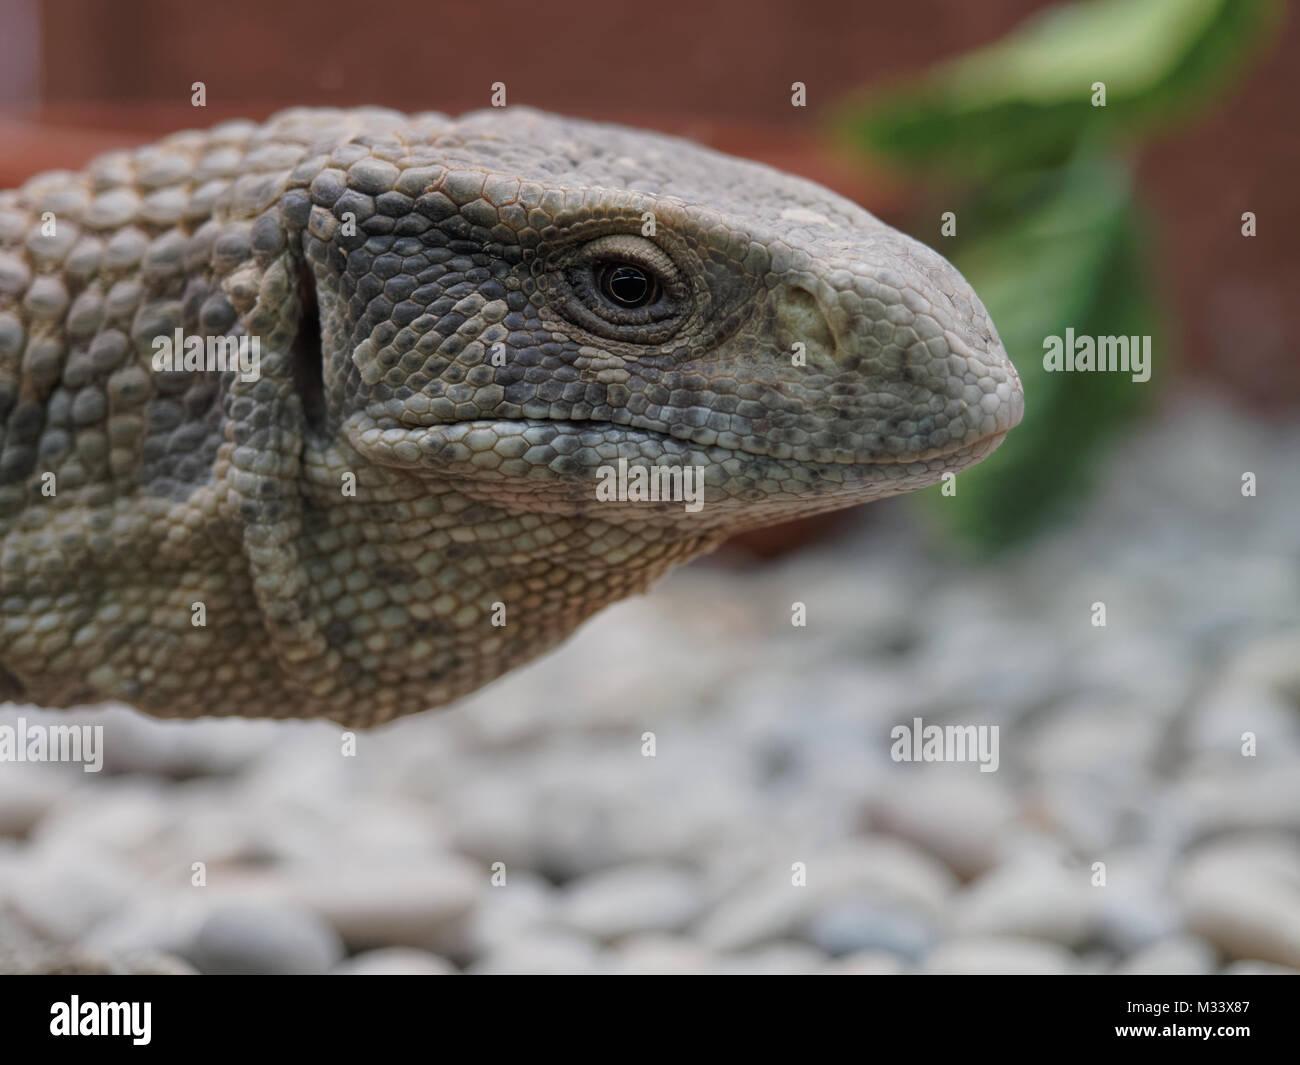 Closeup shot of Monitor lizard, Komodo dragon, head in the zoo - Stock Image